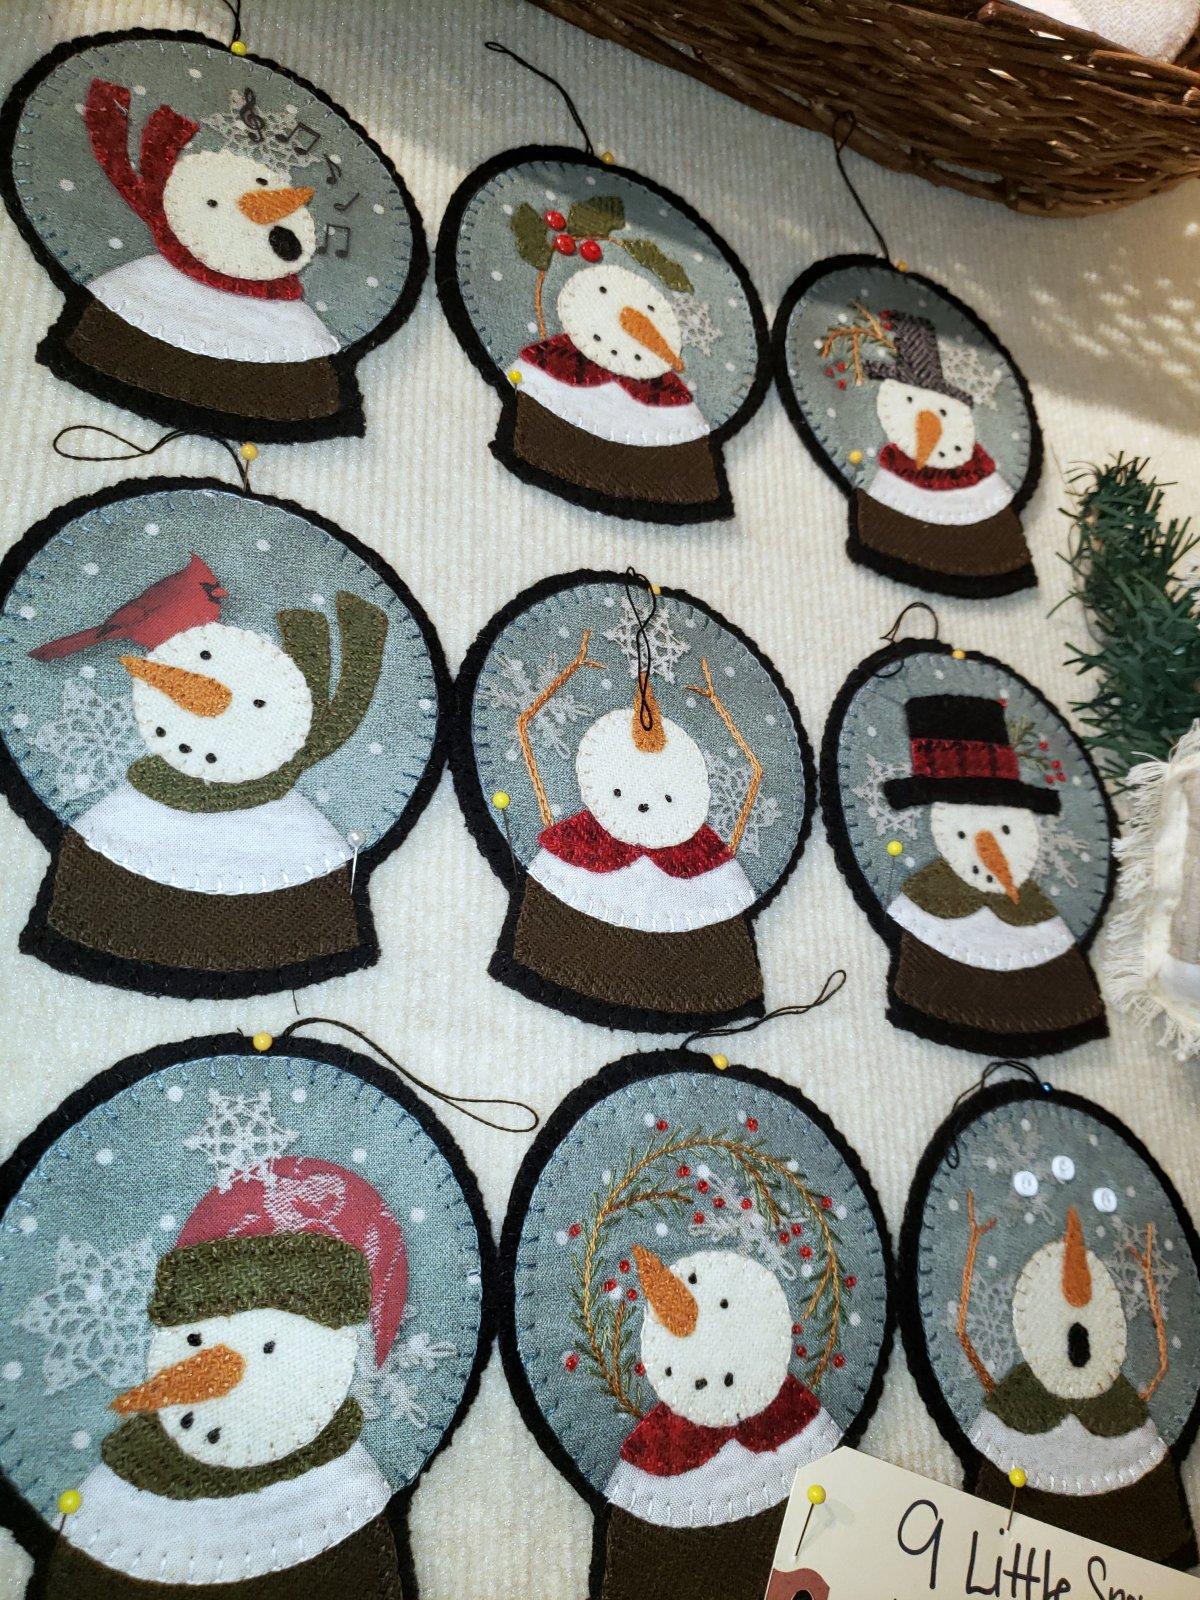 9 Little Snowman Wool Ornament Kit